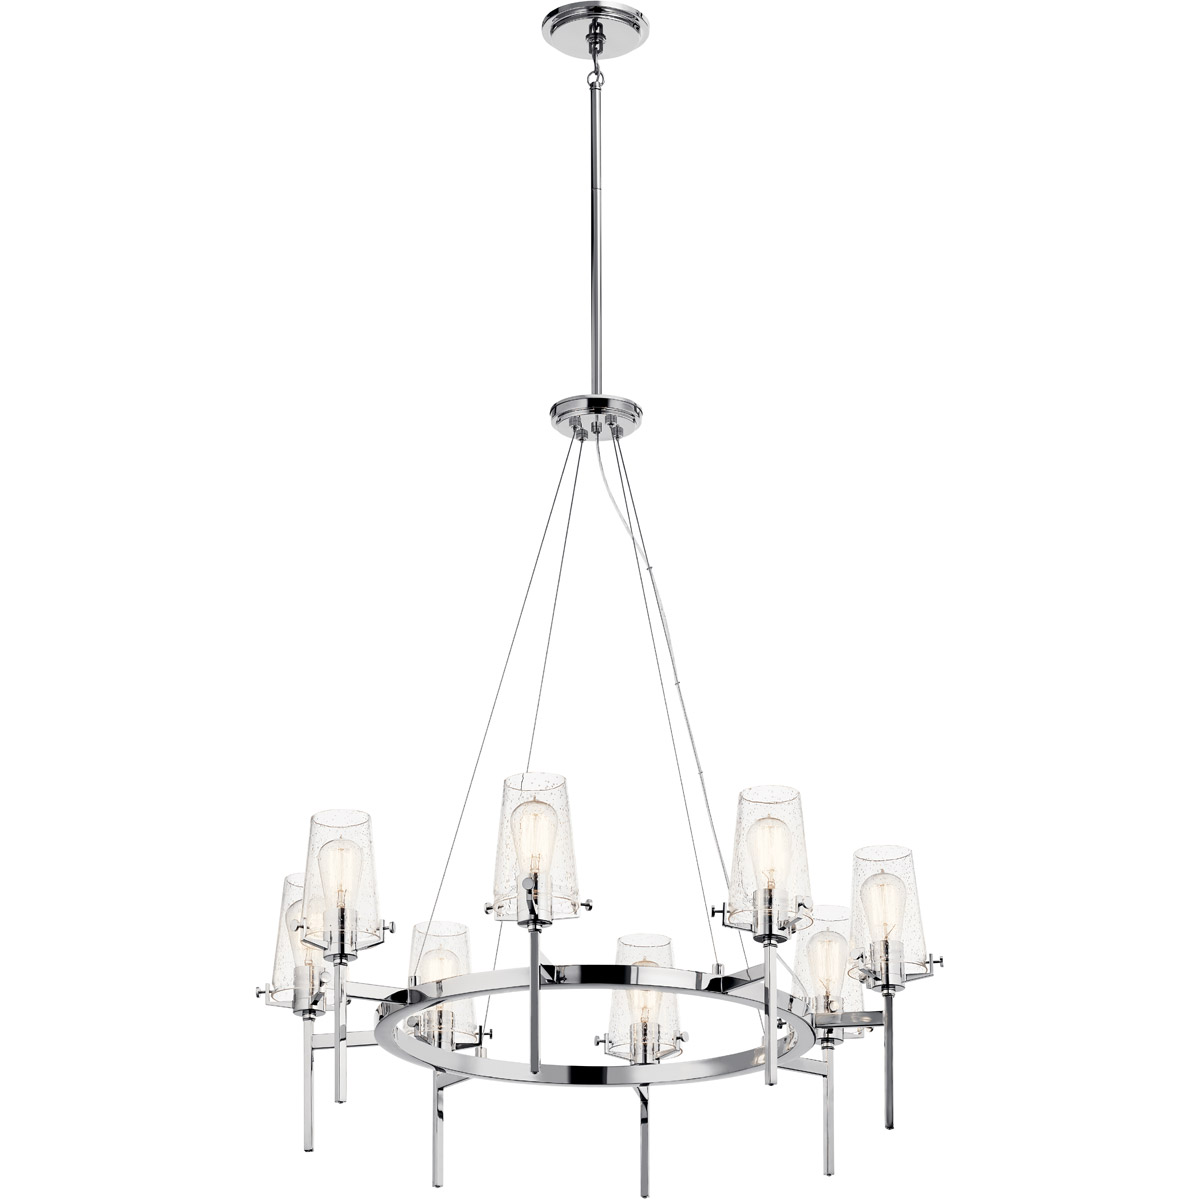 Details About Kichler Lighting 43695ch Alton 8 Light 38 Inch Chrome Chandelier Ceiling